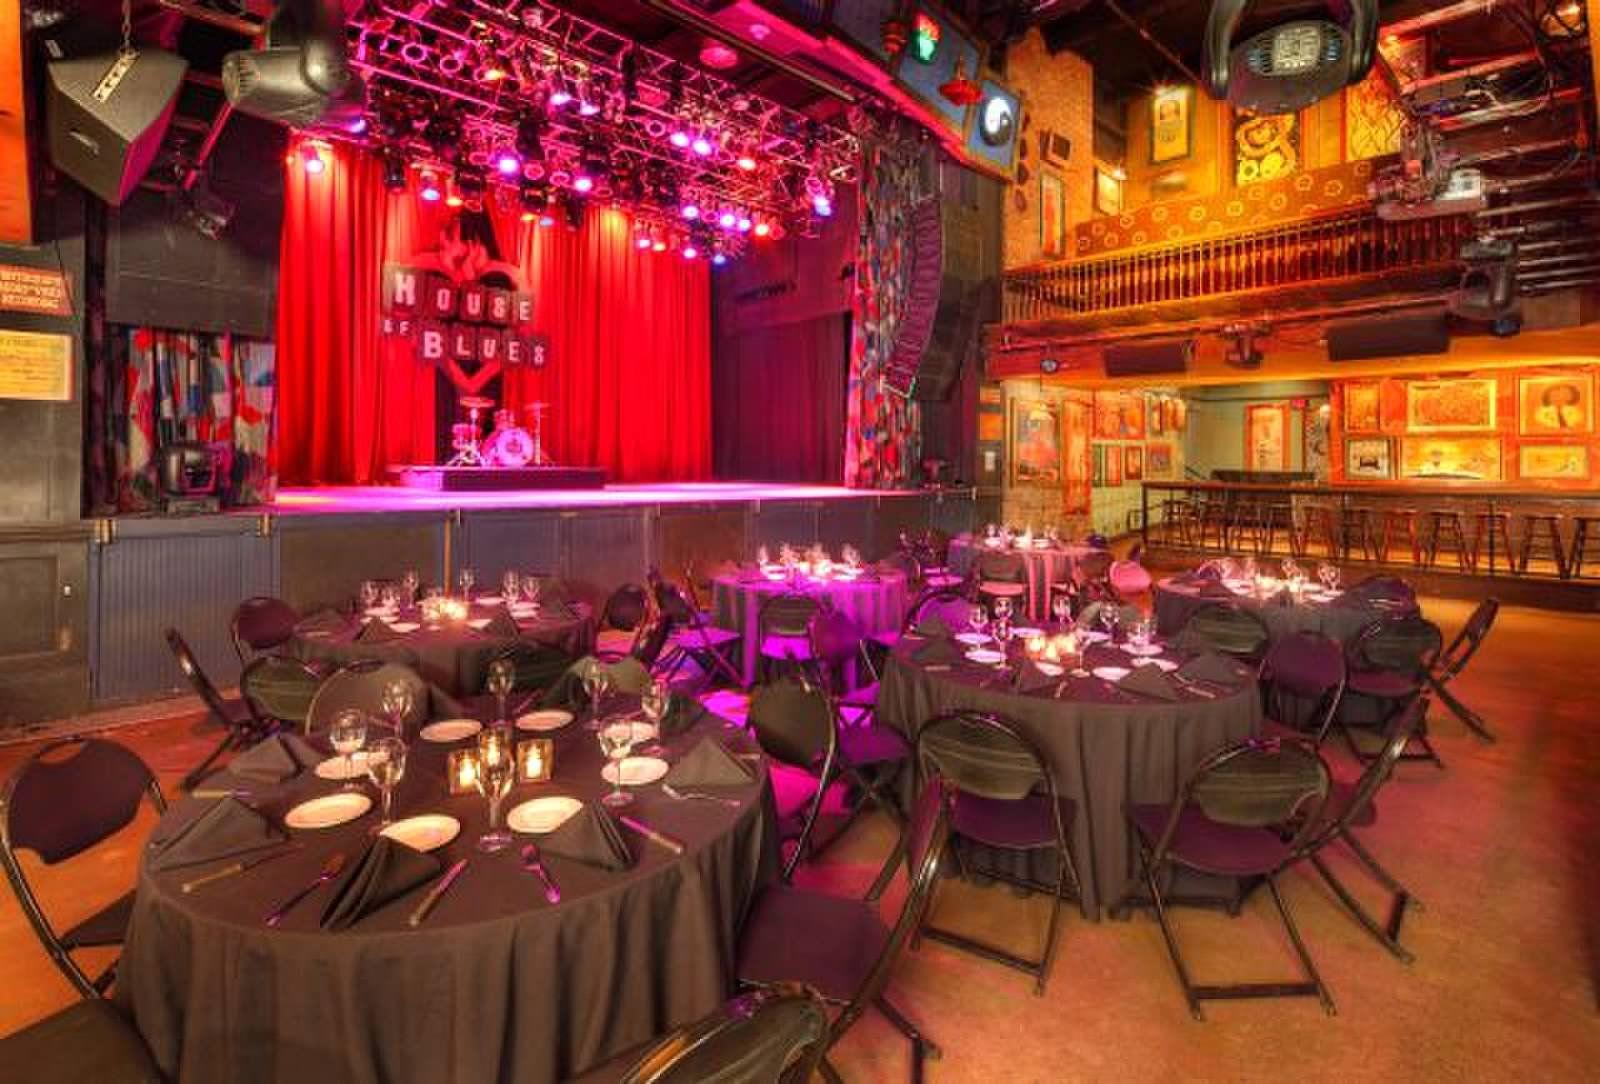 Fountainhead New Rochelle York Wedding Reception Site Ny Geek Ideas Pinterest Venues